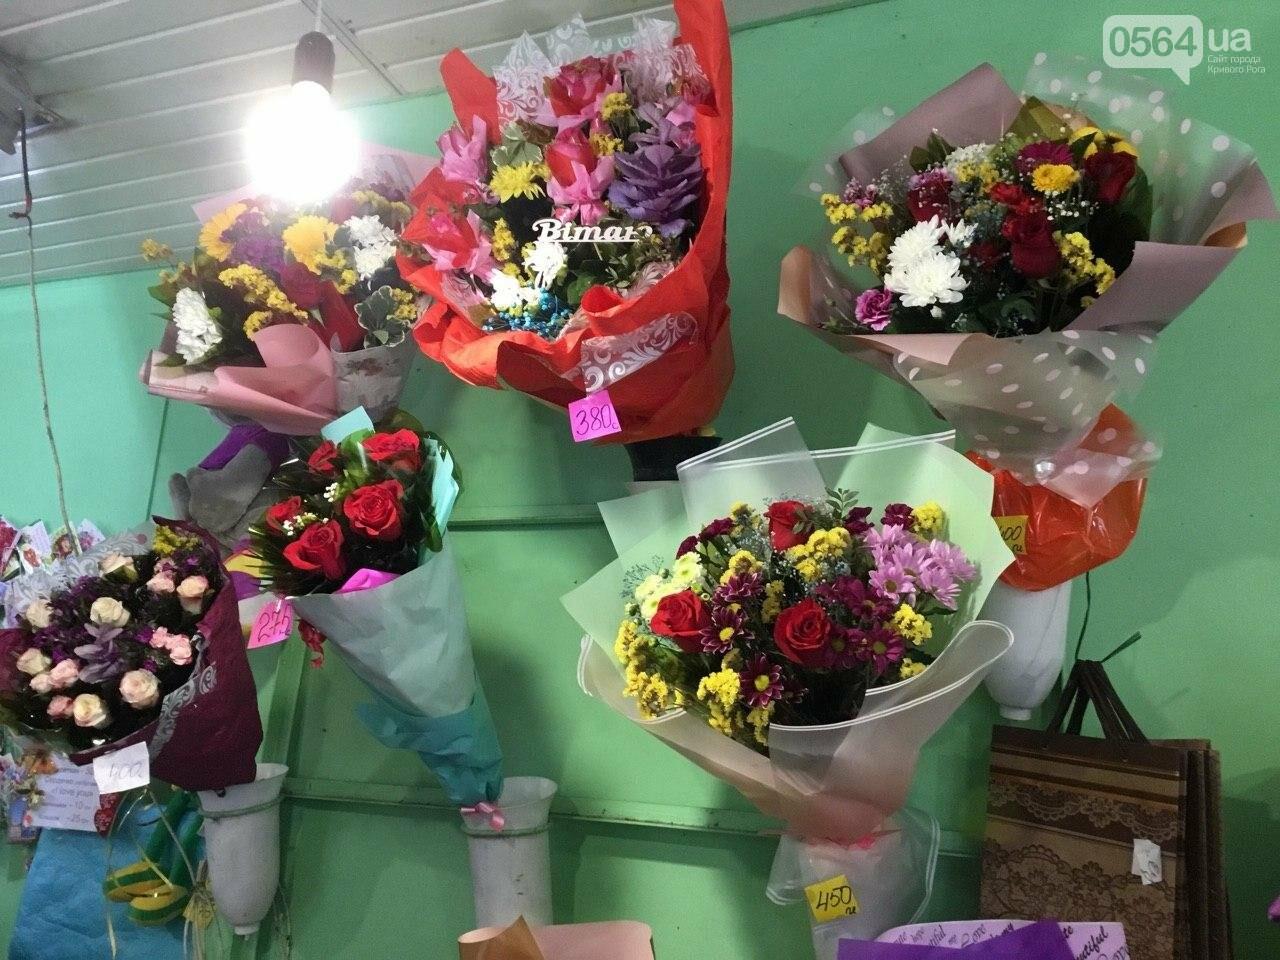 Сколько стоят примула, цикламен, мимоза? Обзор цен на цветы в Кривом Роге, - ФОТО, ВИДЕО, фото-20